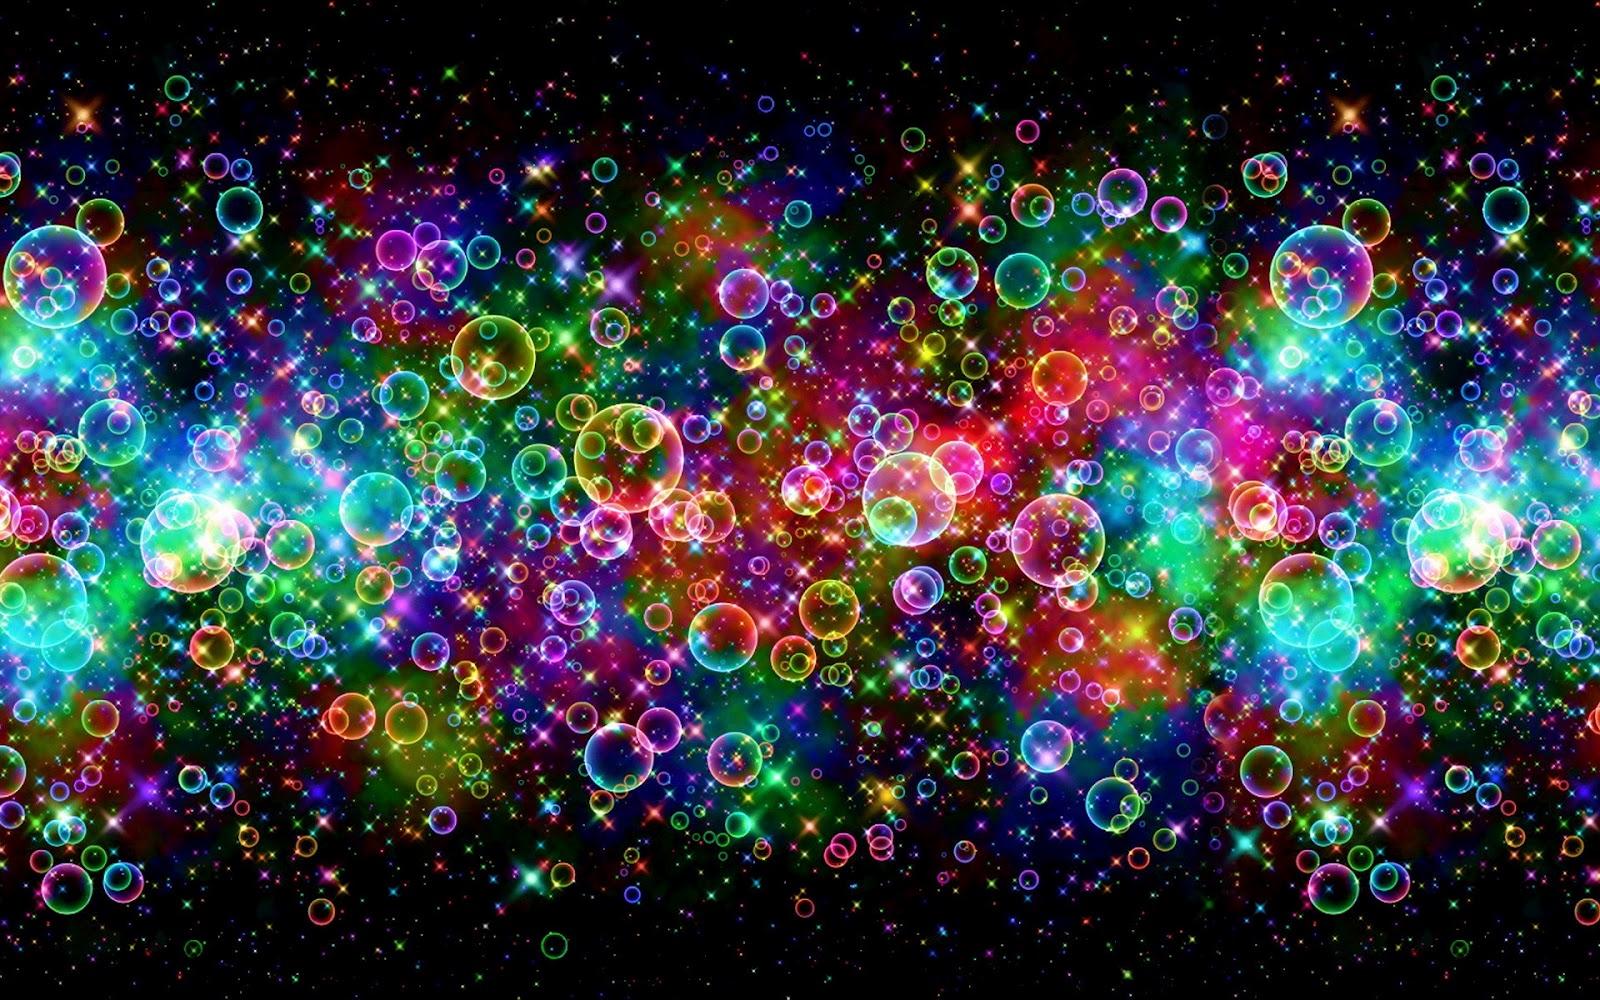 Burbujas De Colores Fondos De Pantalla